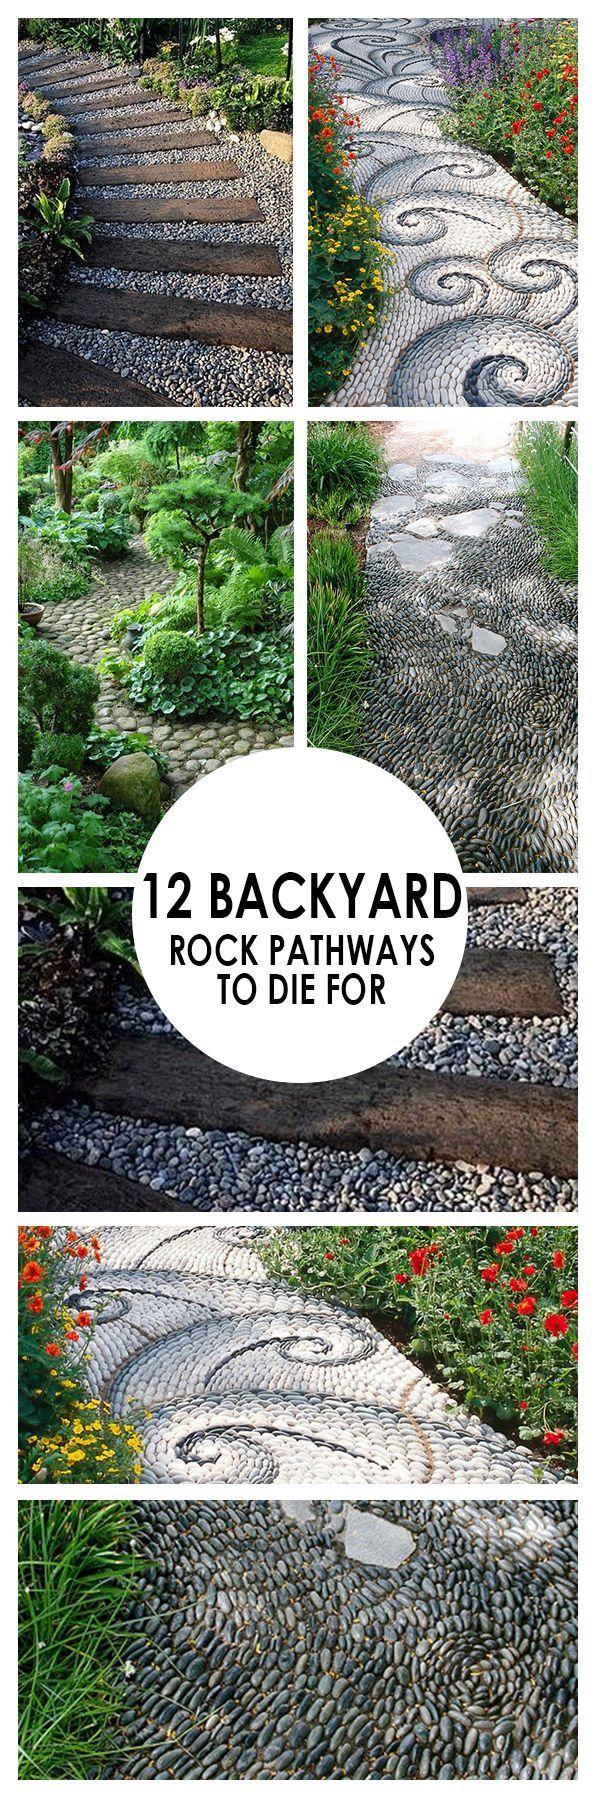 12-Backyard-Rock-Pathways-to-Die-For.jpg 600×1,800 pixels #yeswefixgadgets #gardening #backyard